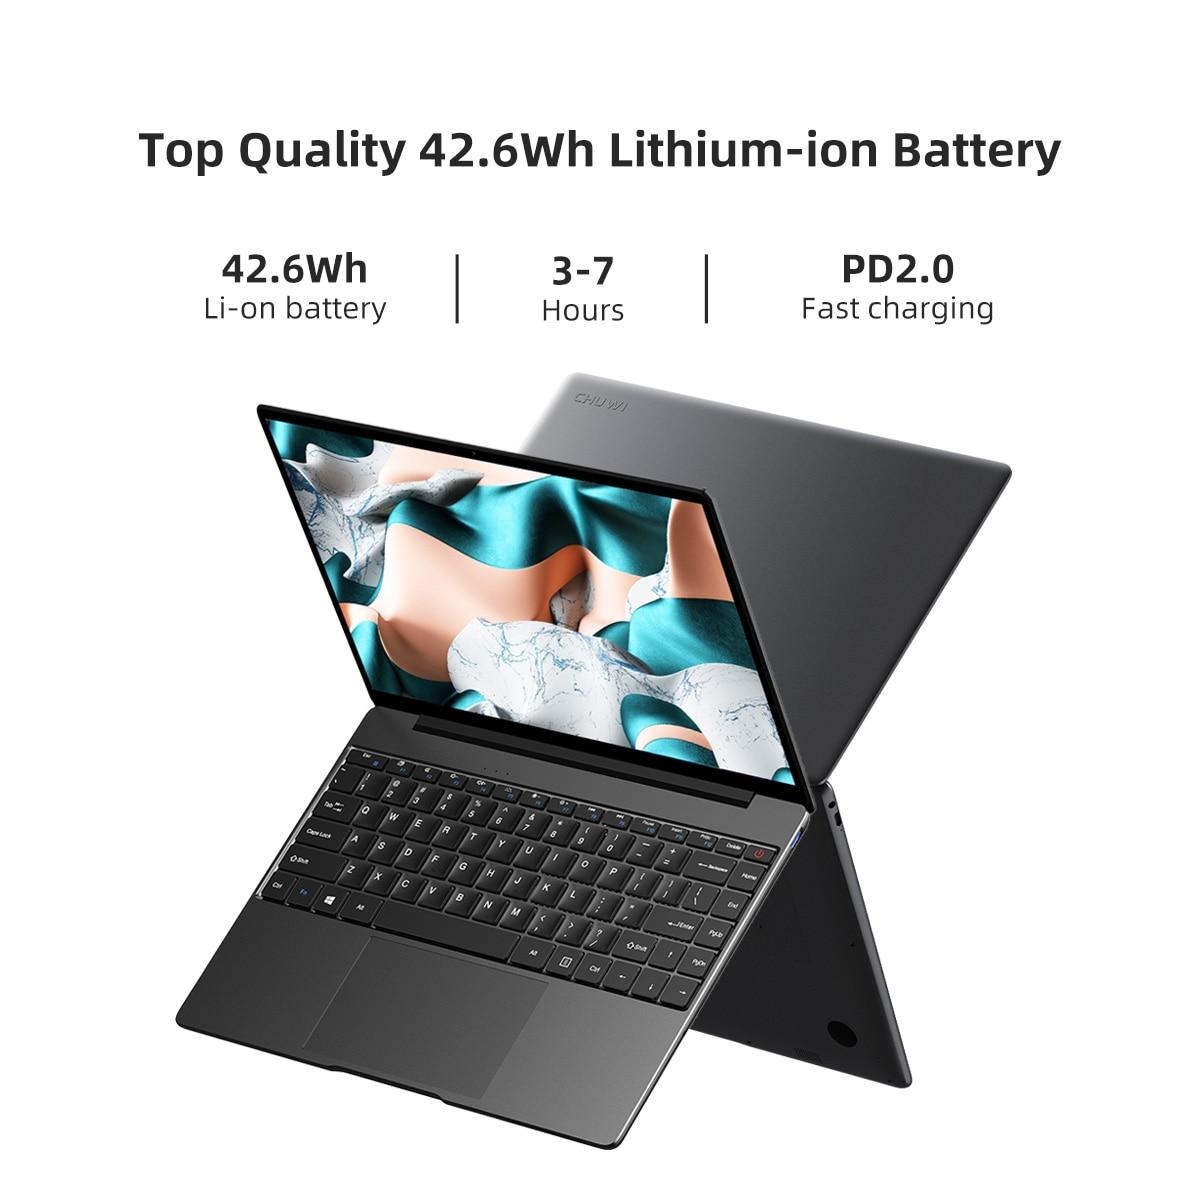 CHUWI CoreBook X Intel Core i5-8259U Laptops 14 Inch 2160x1440 Resolution DDR4 8GB 512GB SSD Winddows 10 Computer 46.2W Battery 10